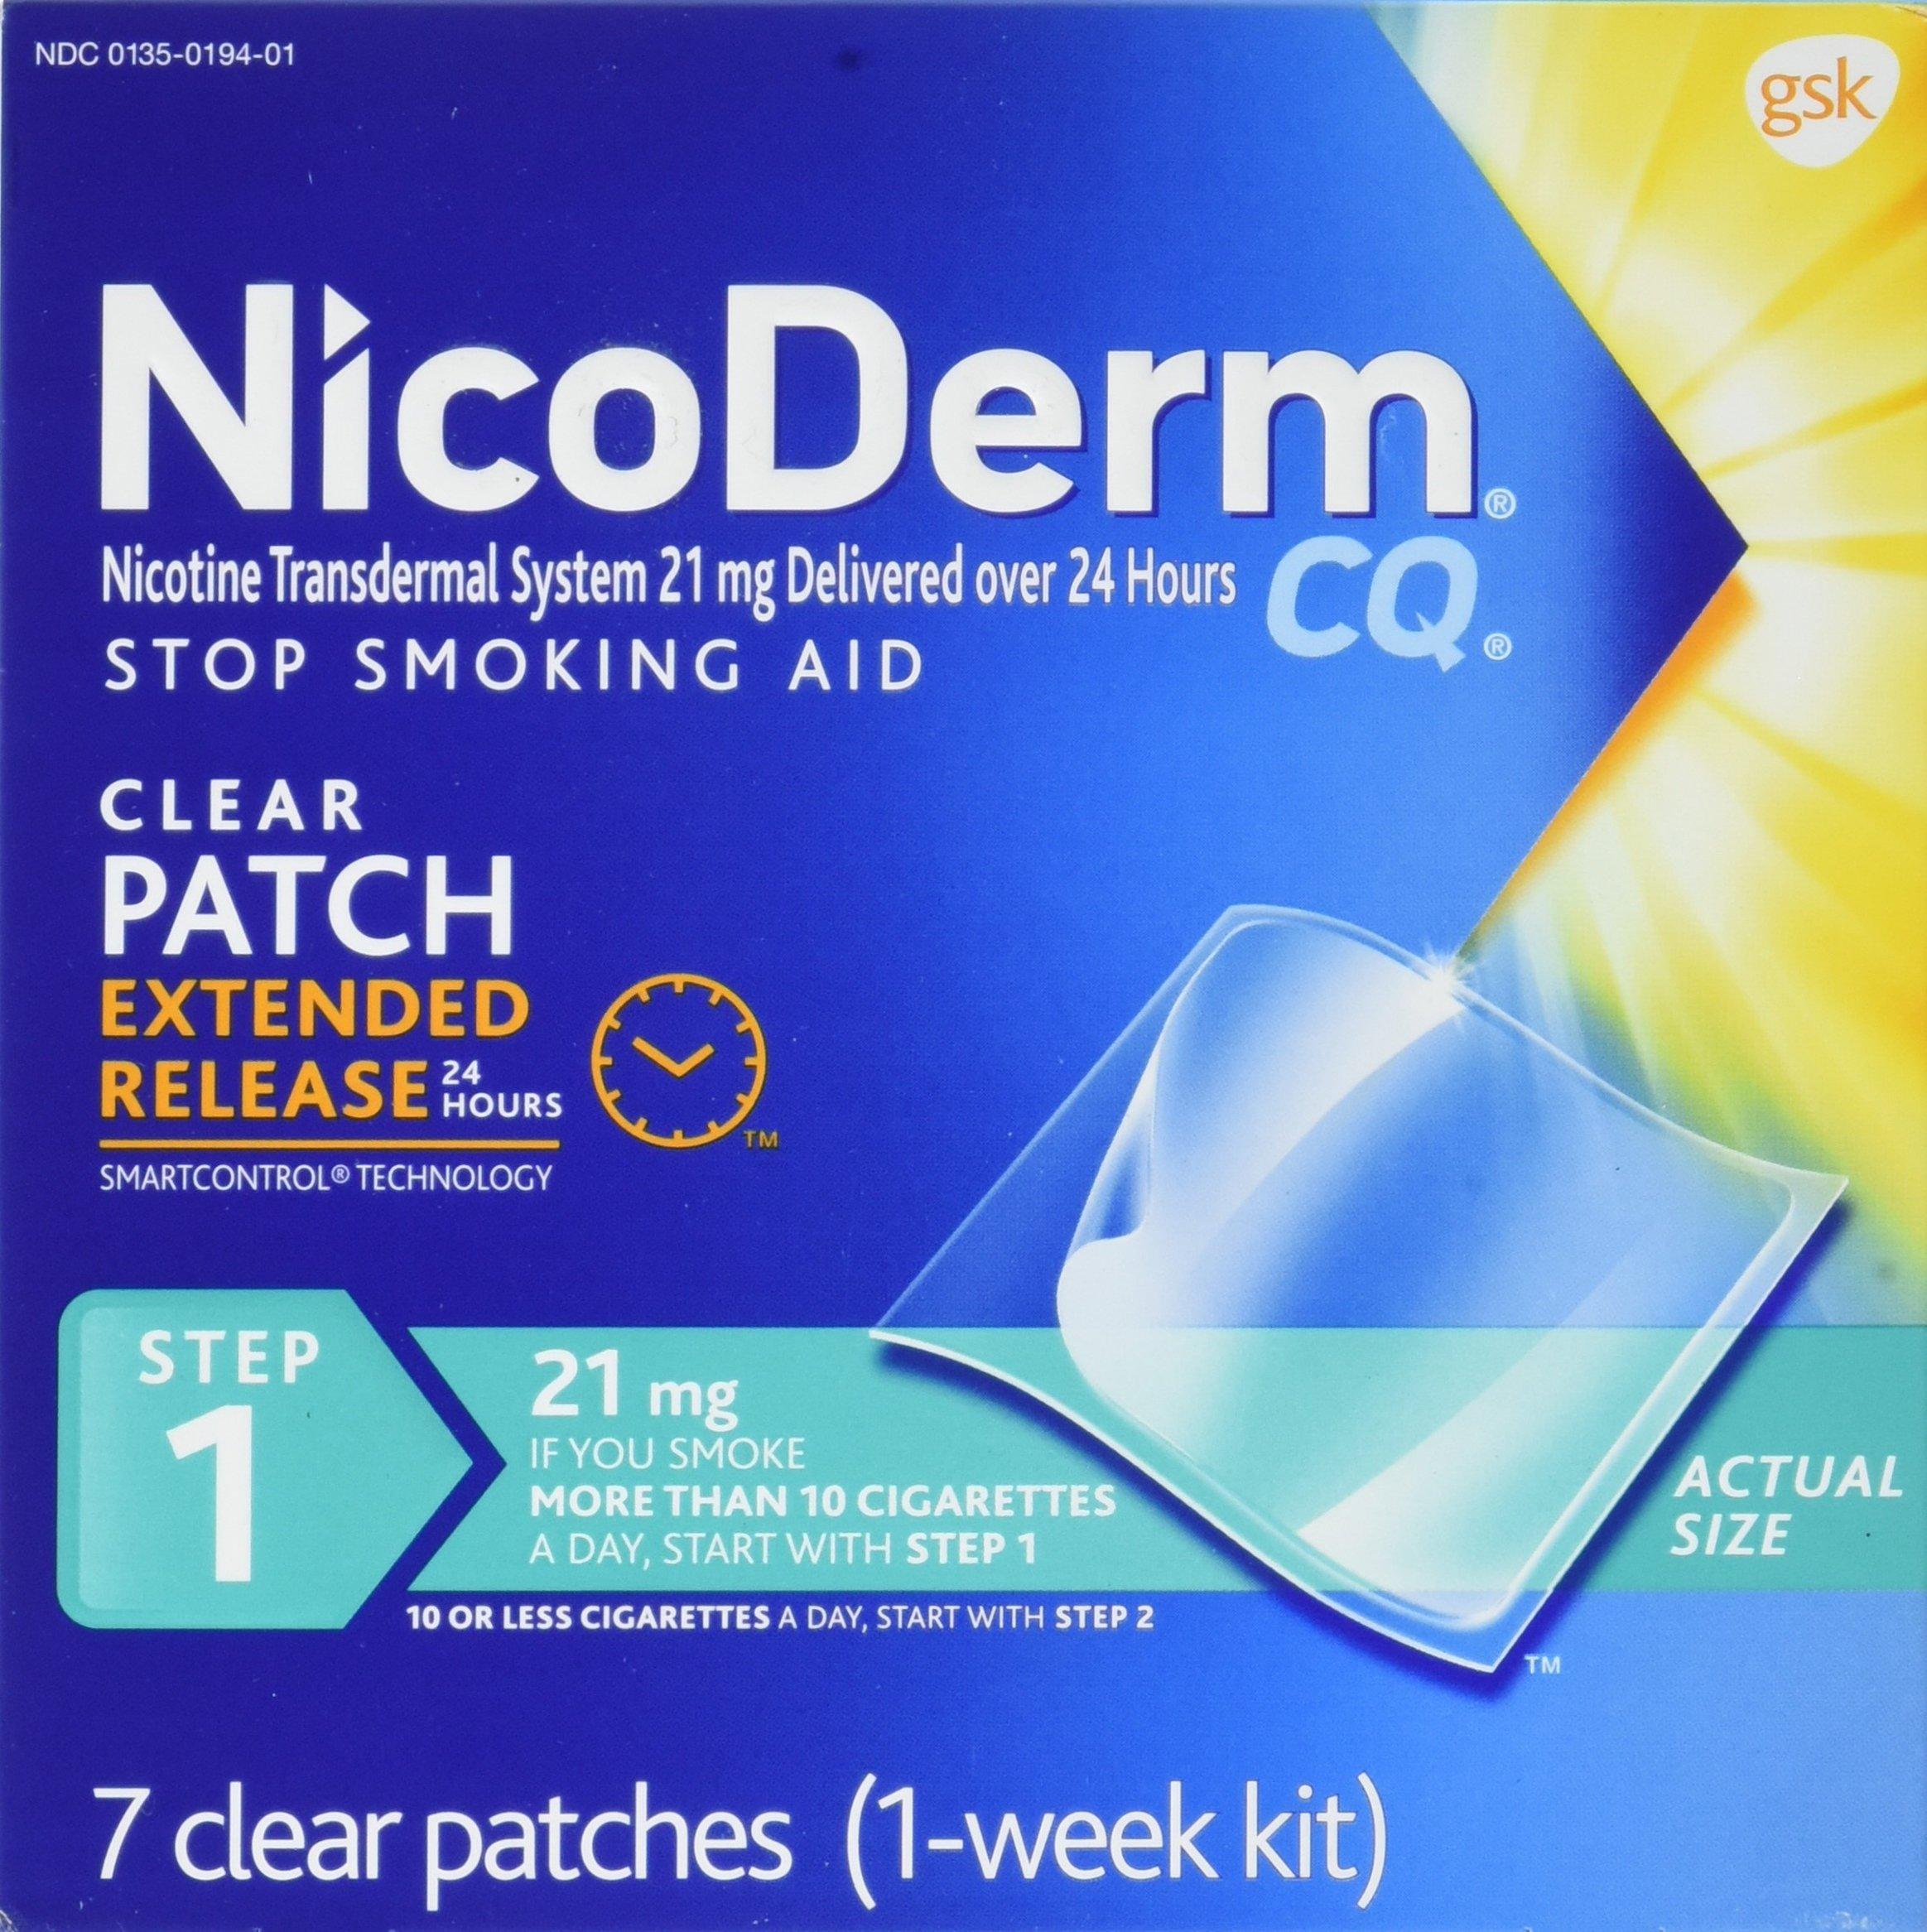 NicoDerm CQ Nicotine Patch, Clear, Step 1 to Quit Smoking, 21mg, 7 Count by NicoDerm CQ